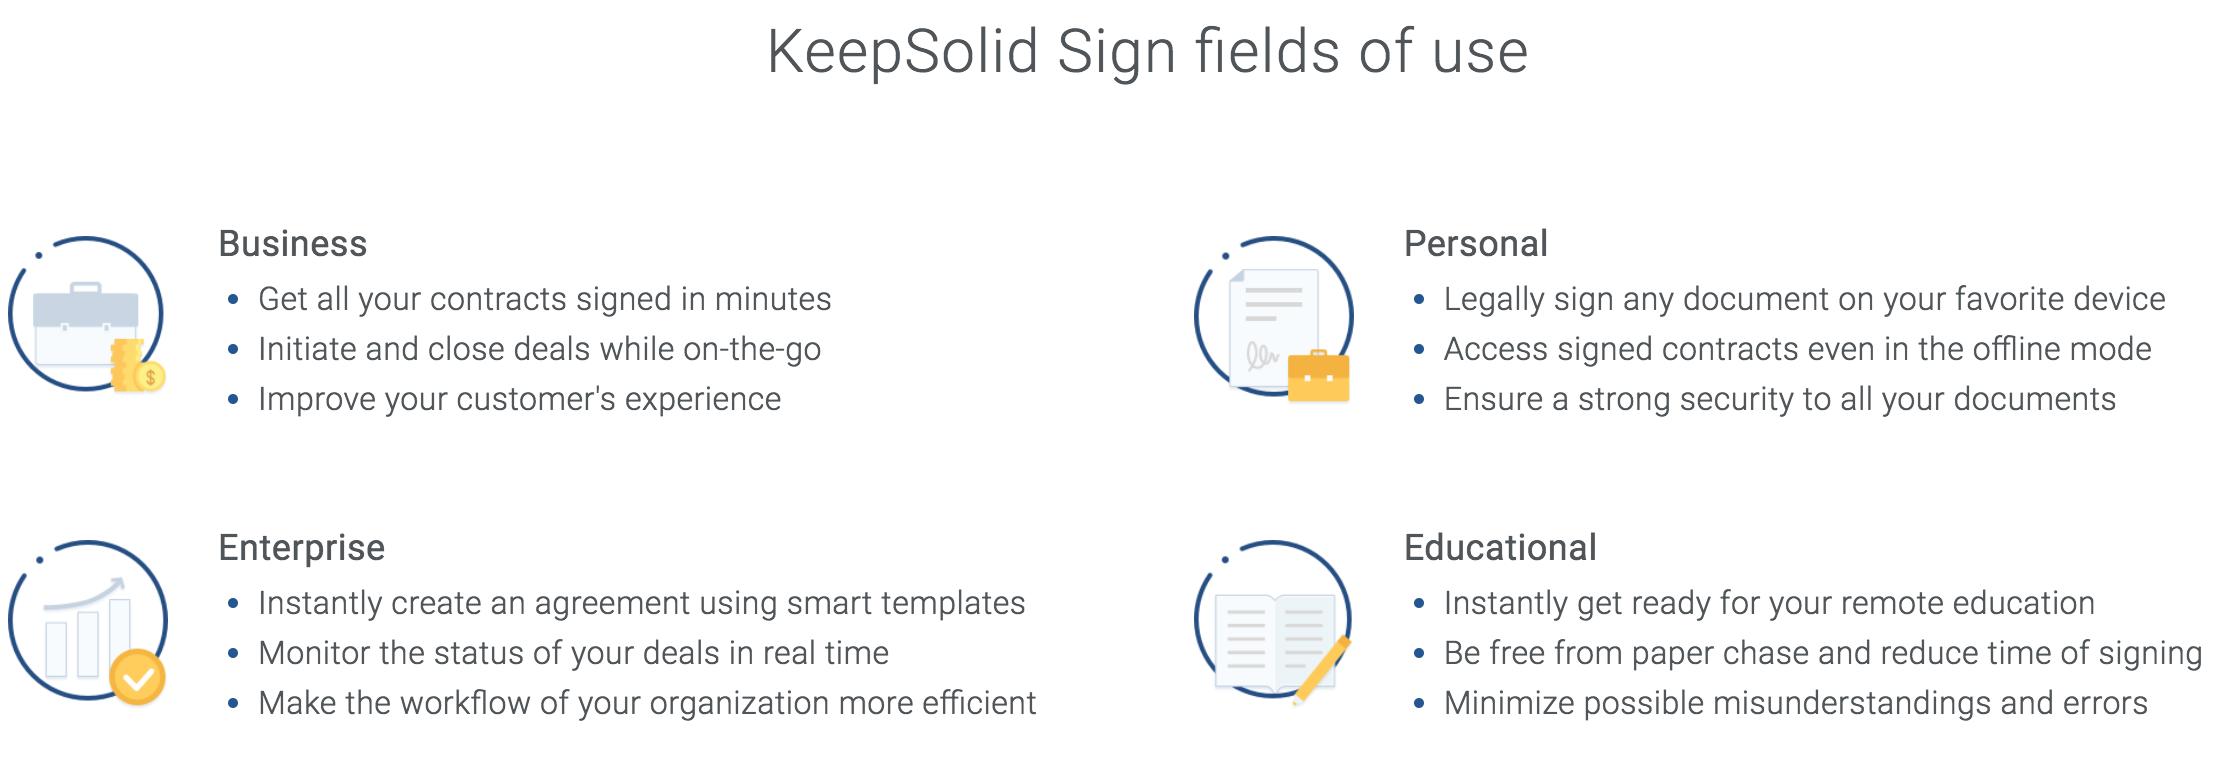 KeepSolid Sign fields